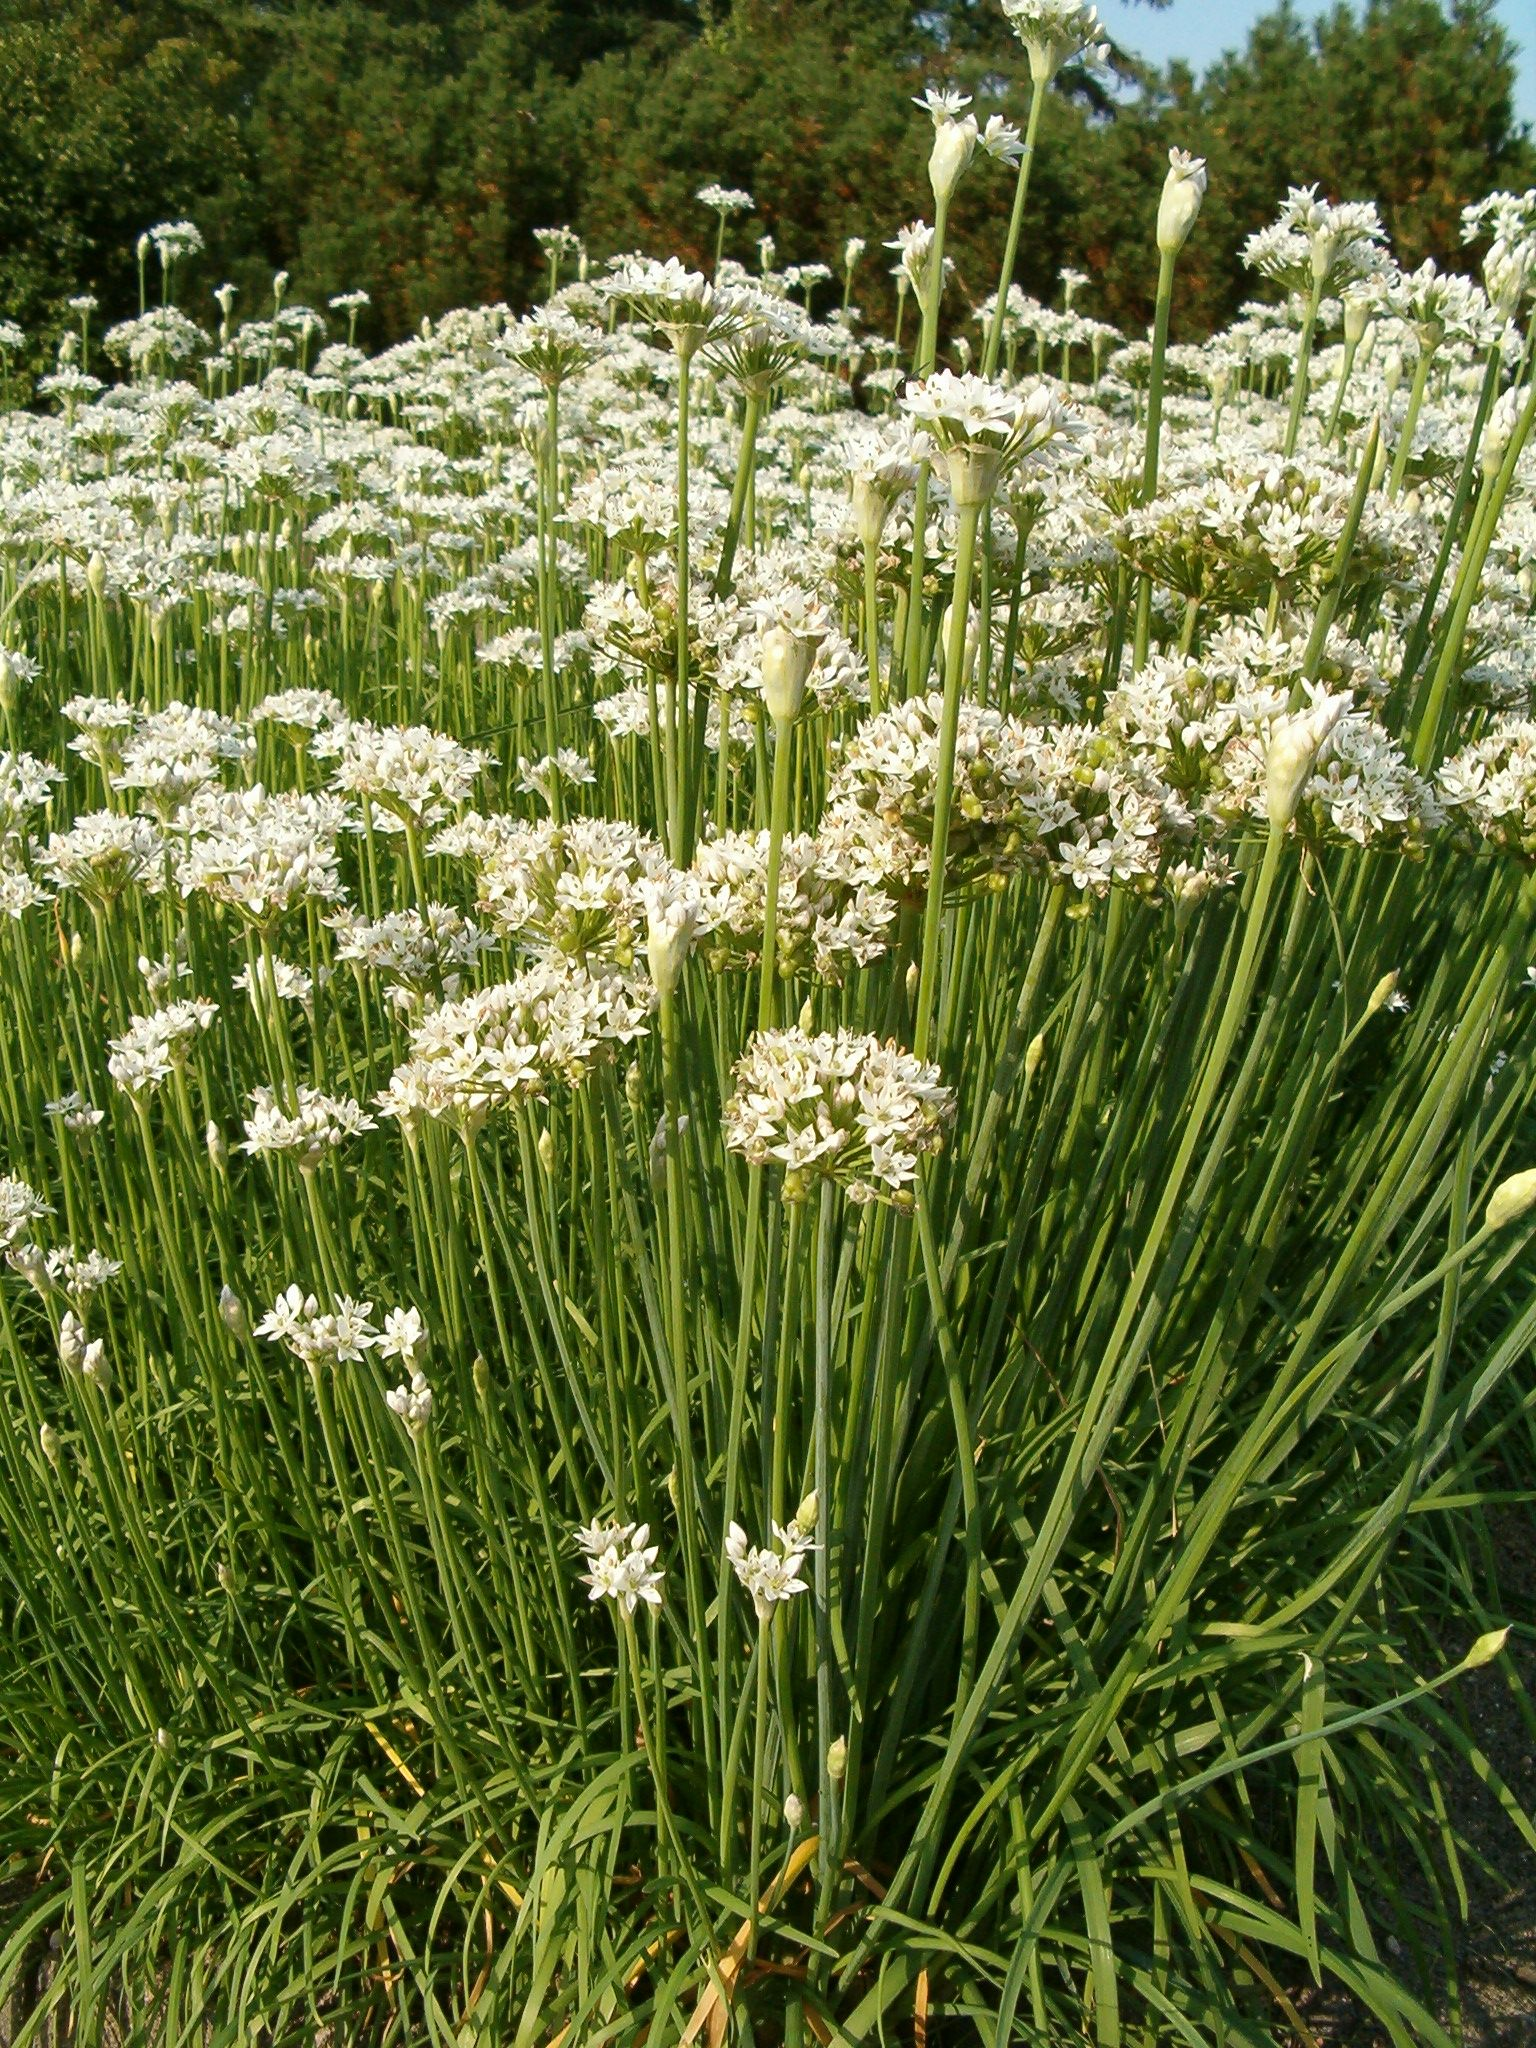 garlic chives allium tuberosum similar in appearance to regular chives ...